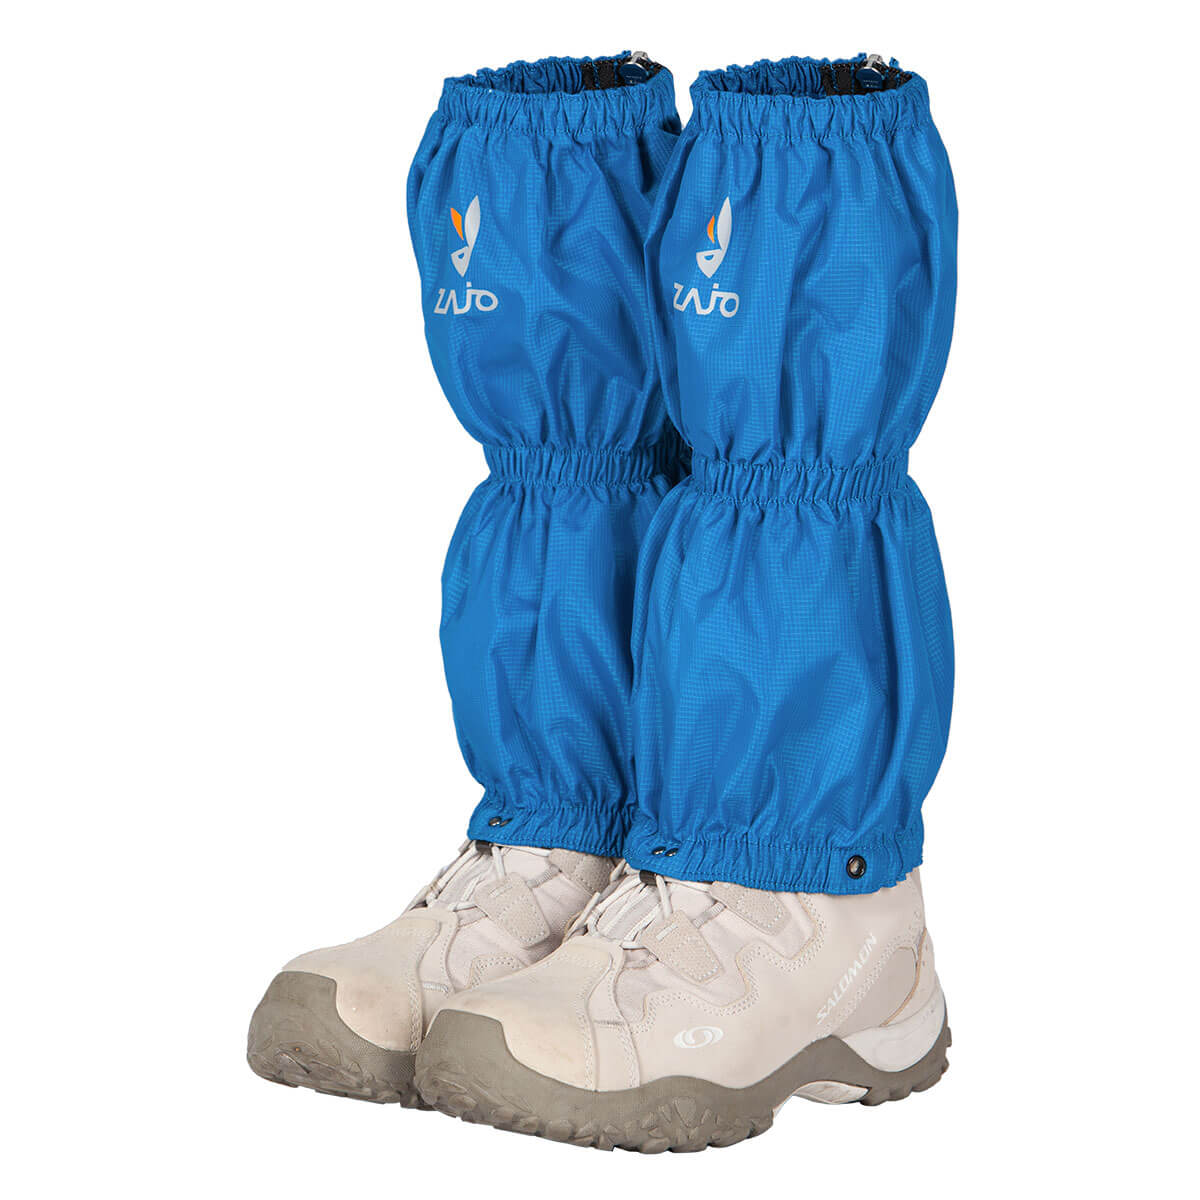 ZAJO Návleky na nohavice Gaiter Hike Greek Blue S/M